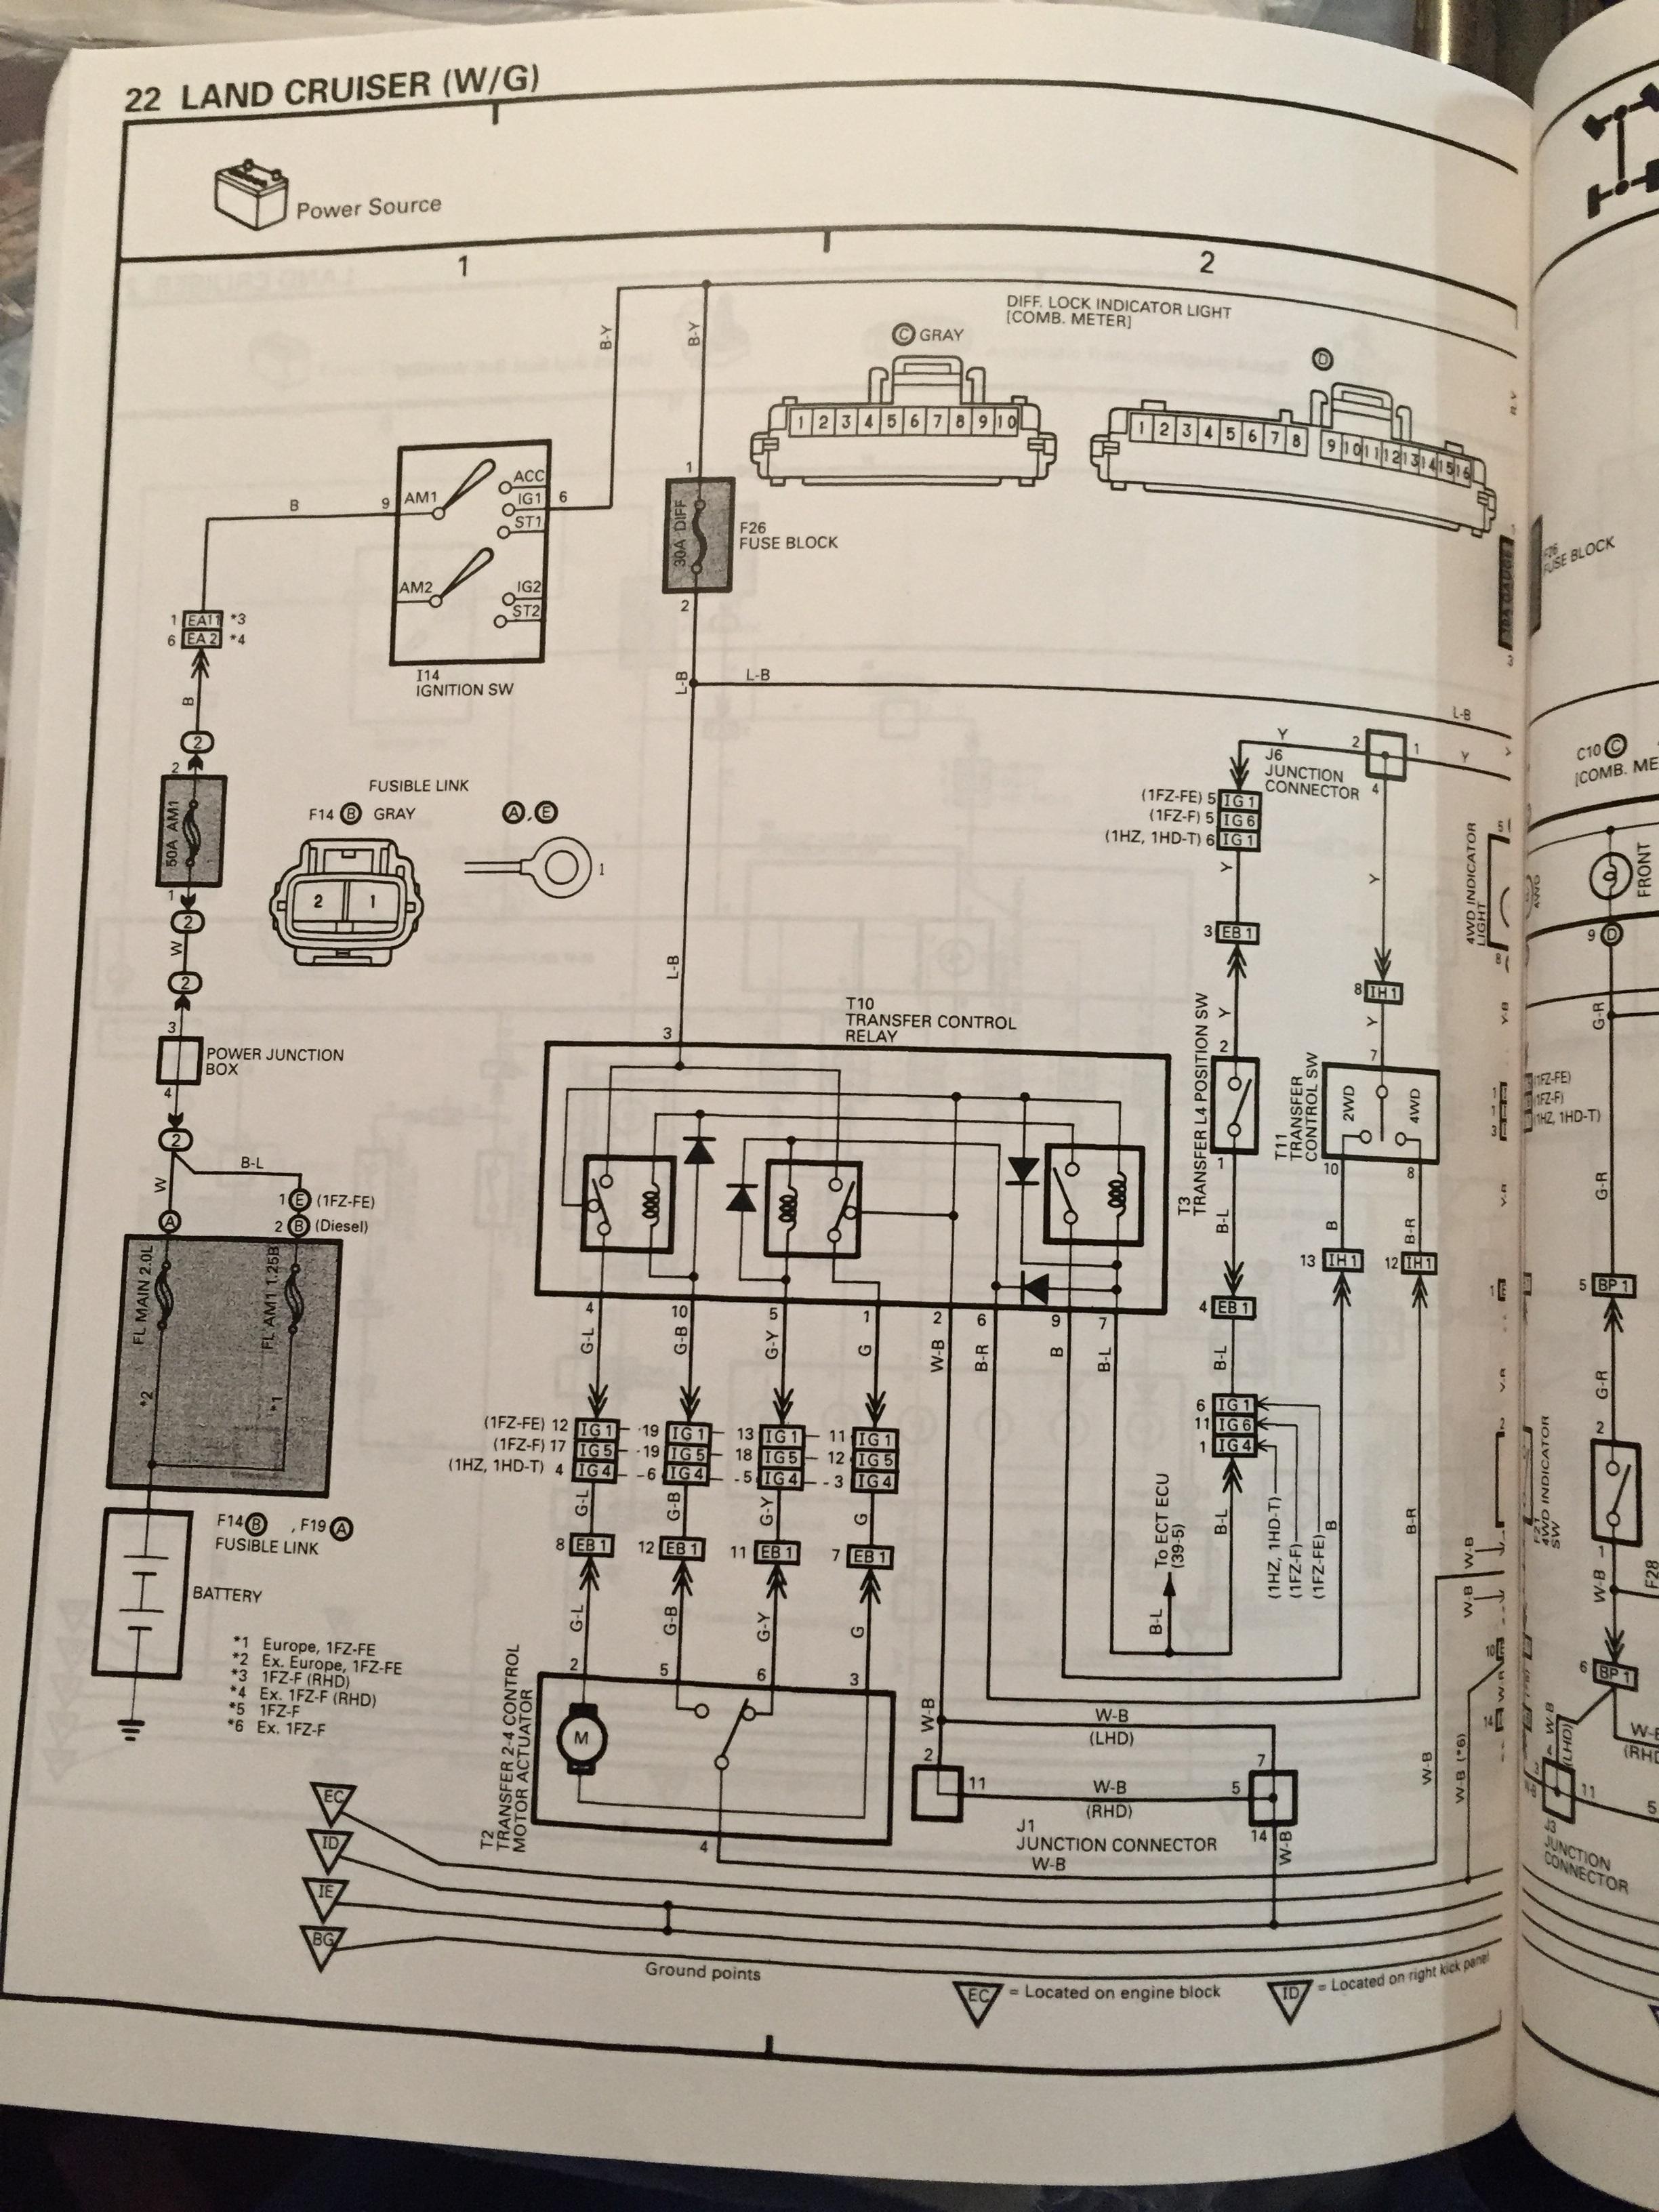 Fitting Factory Lockers Missing Wiring Land Cruiser Club Fj60 Diagram Temp Sending Iphone6 005